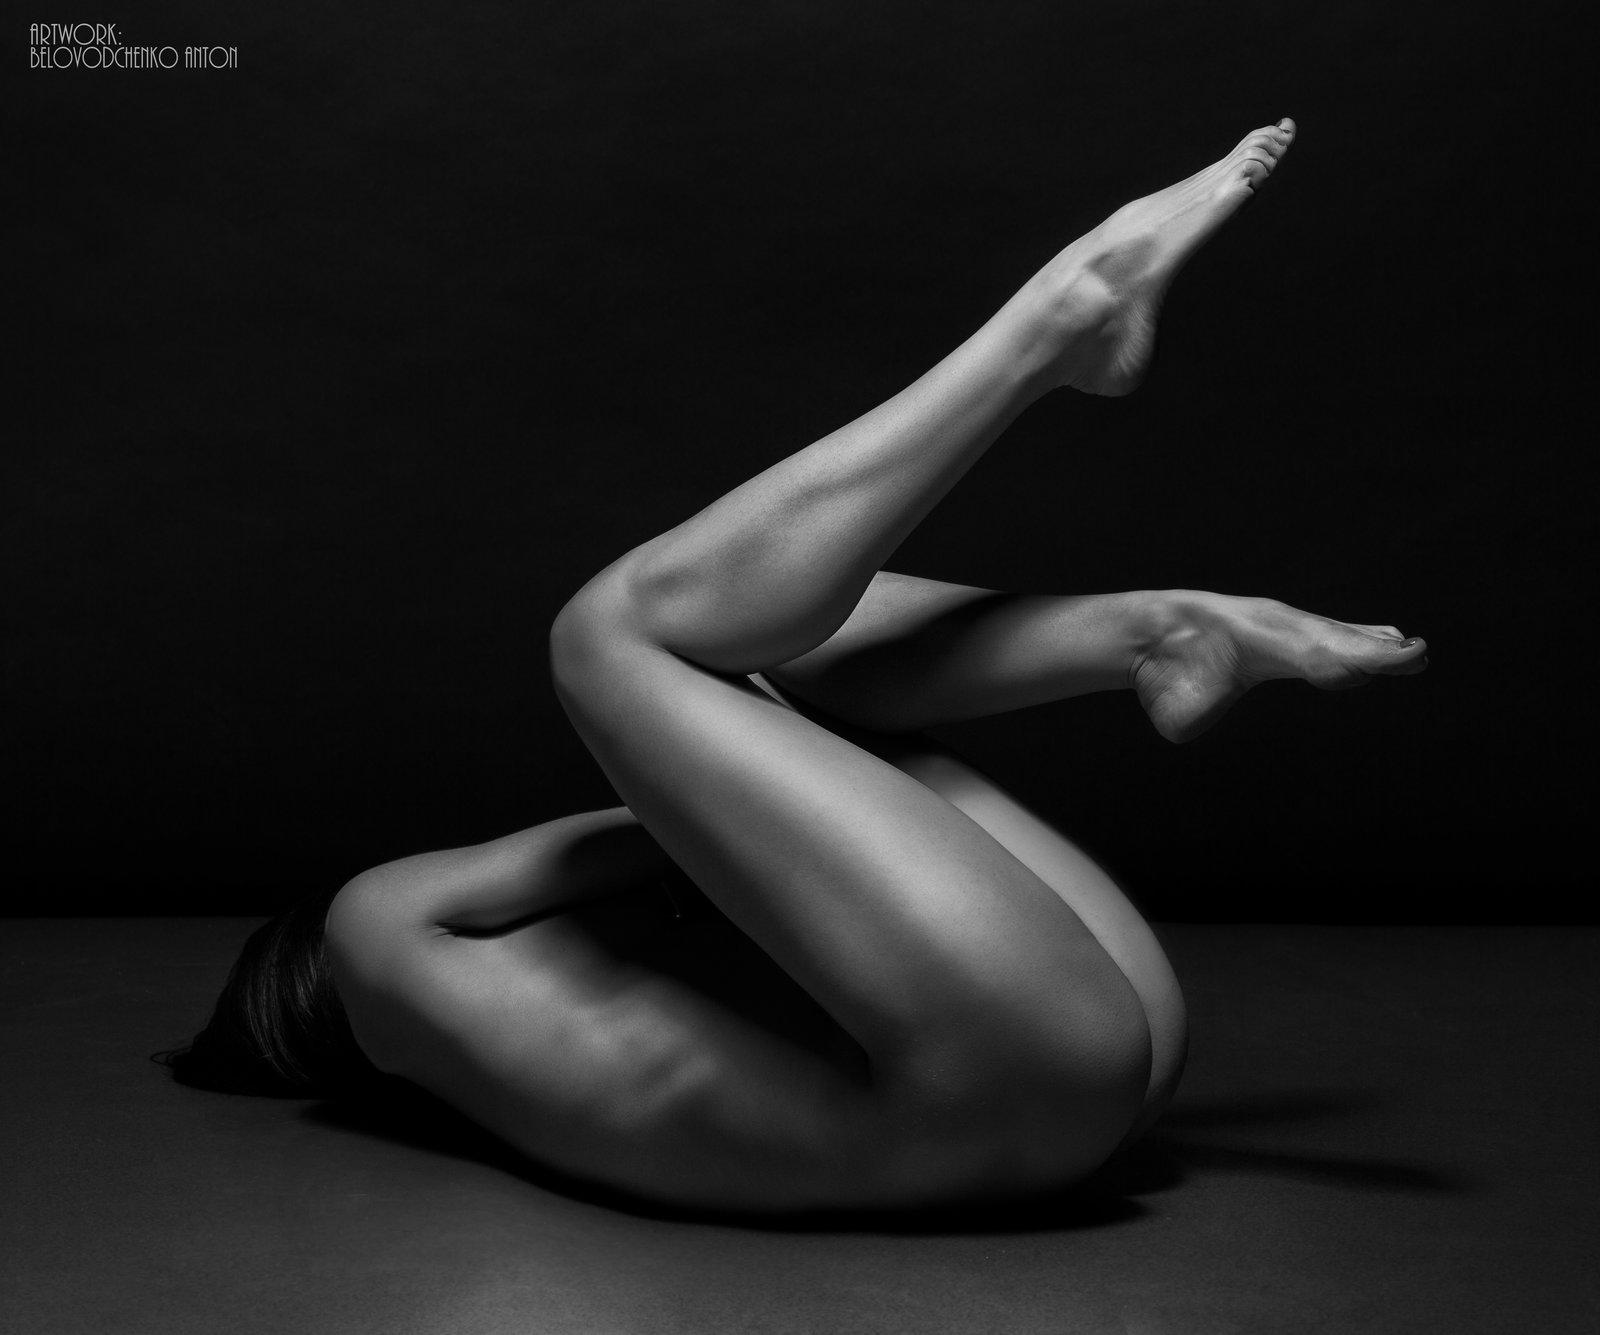 bodyscape_by_belovodchenko-d7zi5v4.jpg